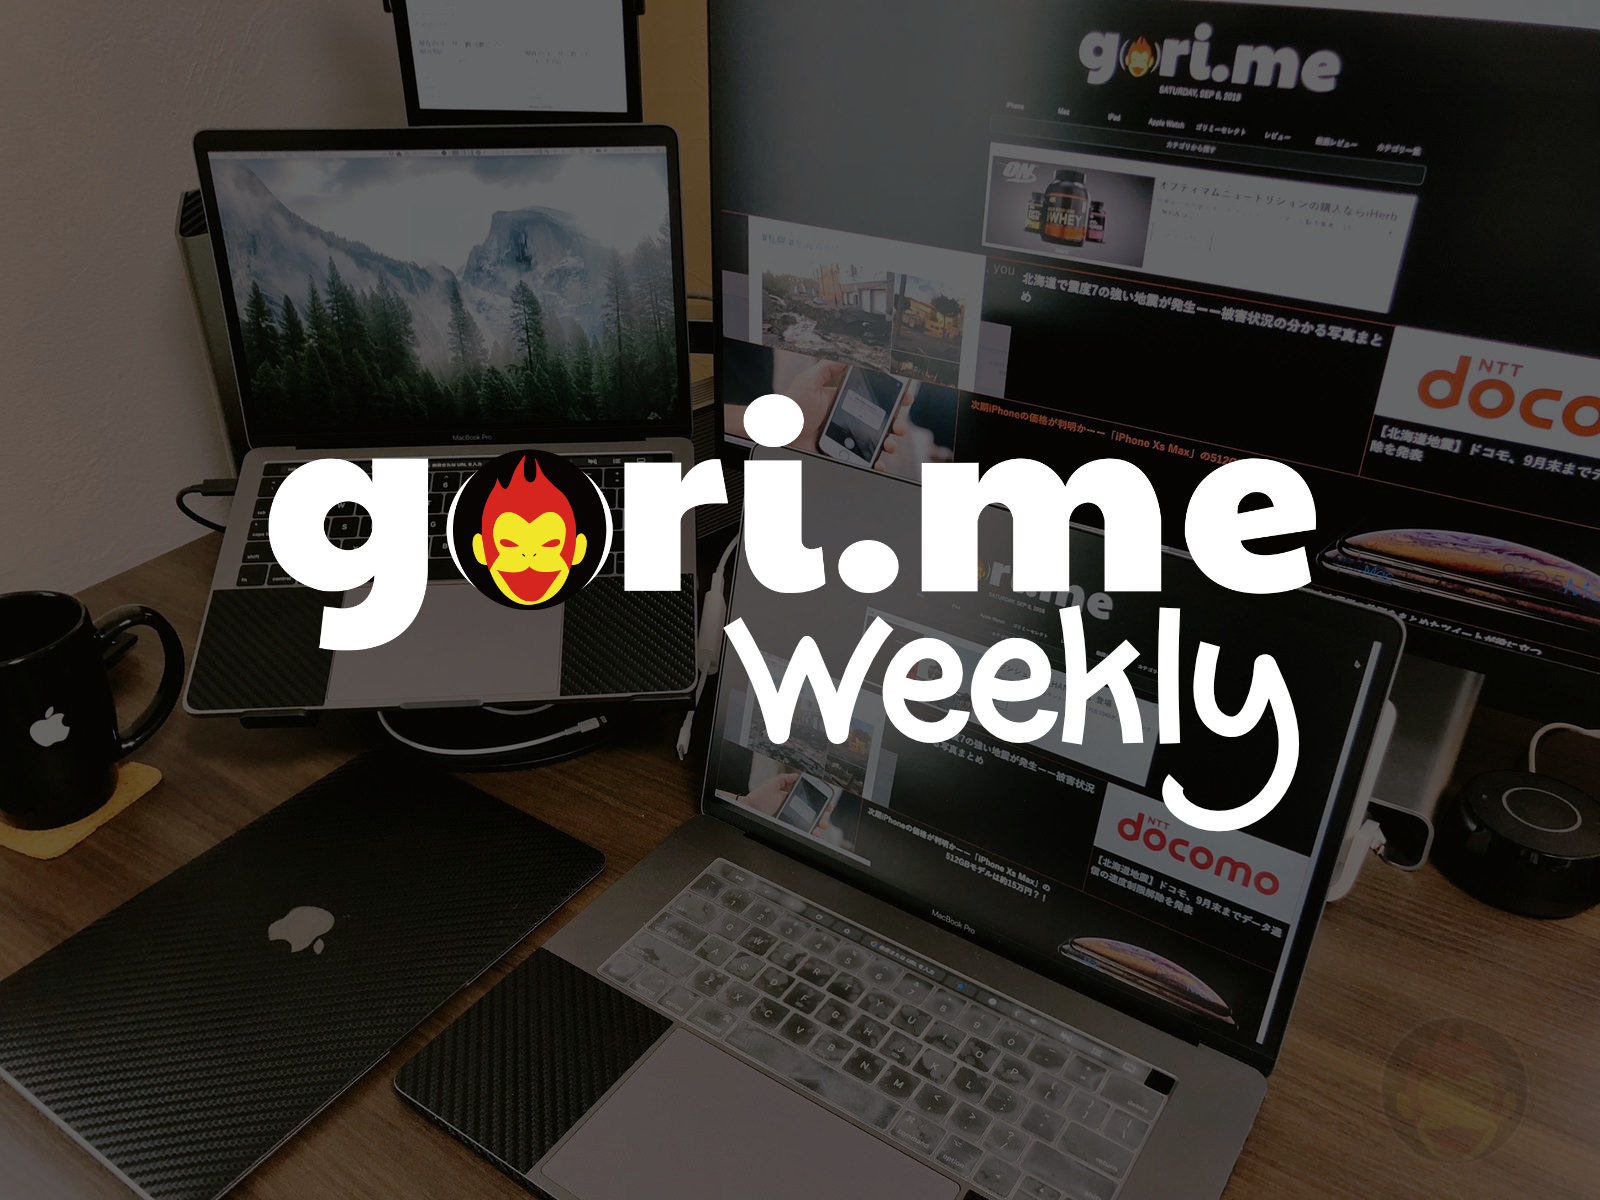 Gorime weekly